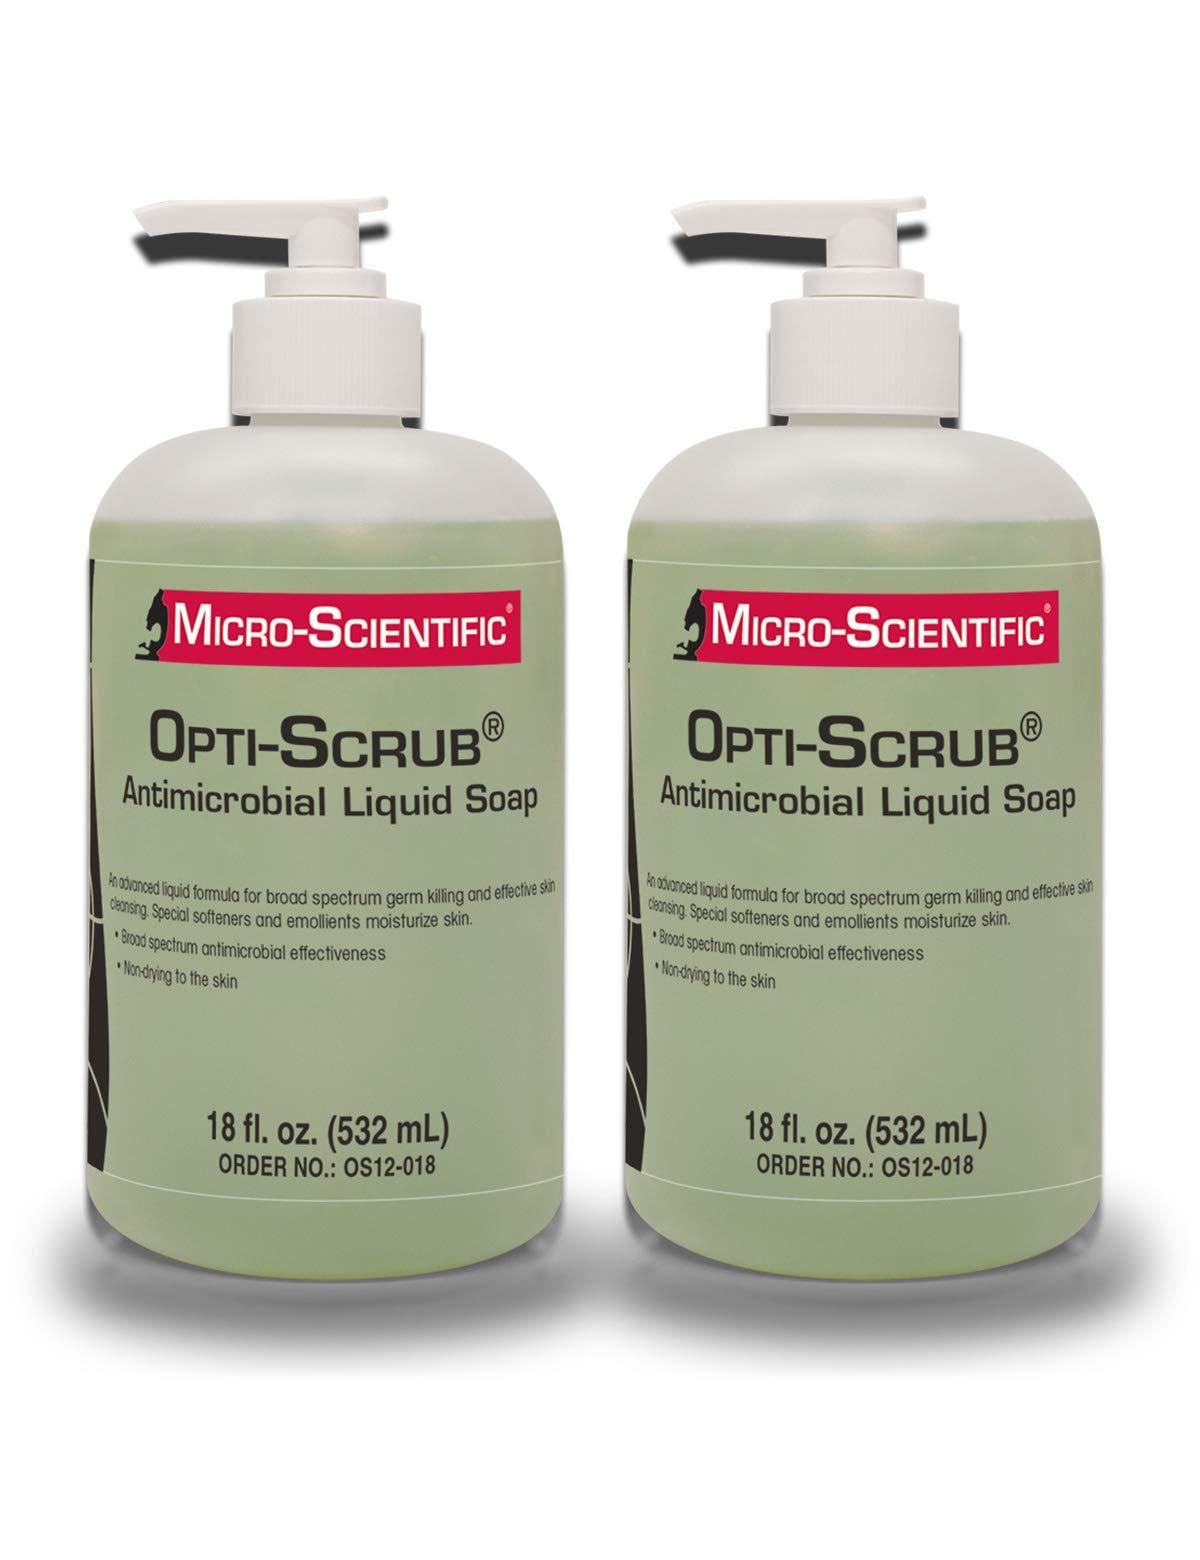 Micro-Scientific (2 Pack 18 Ounce) Opti-Scrub Antimicrobial Liquid Soap, Broad Spectrum, Non-Drying by Micro-Scientific